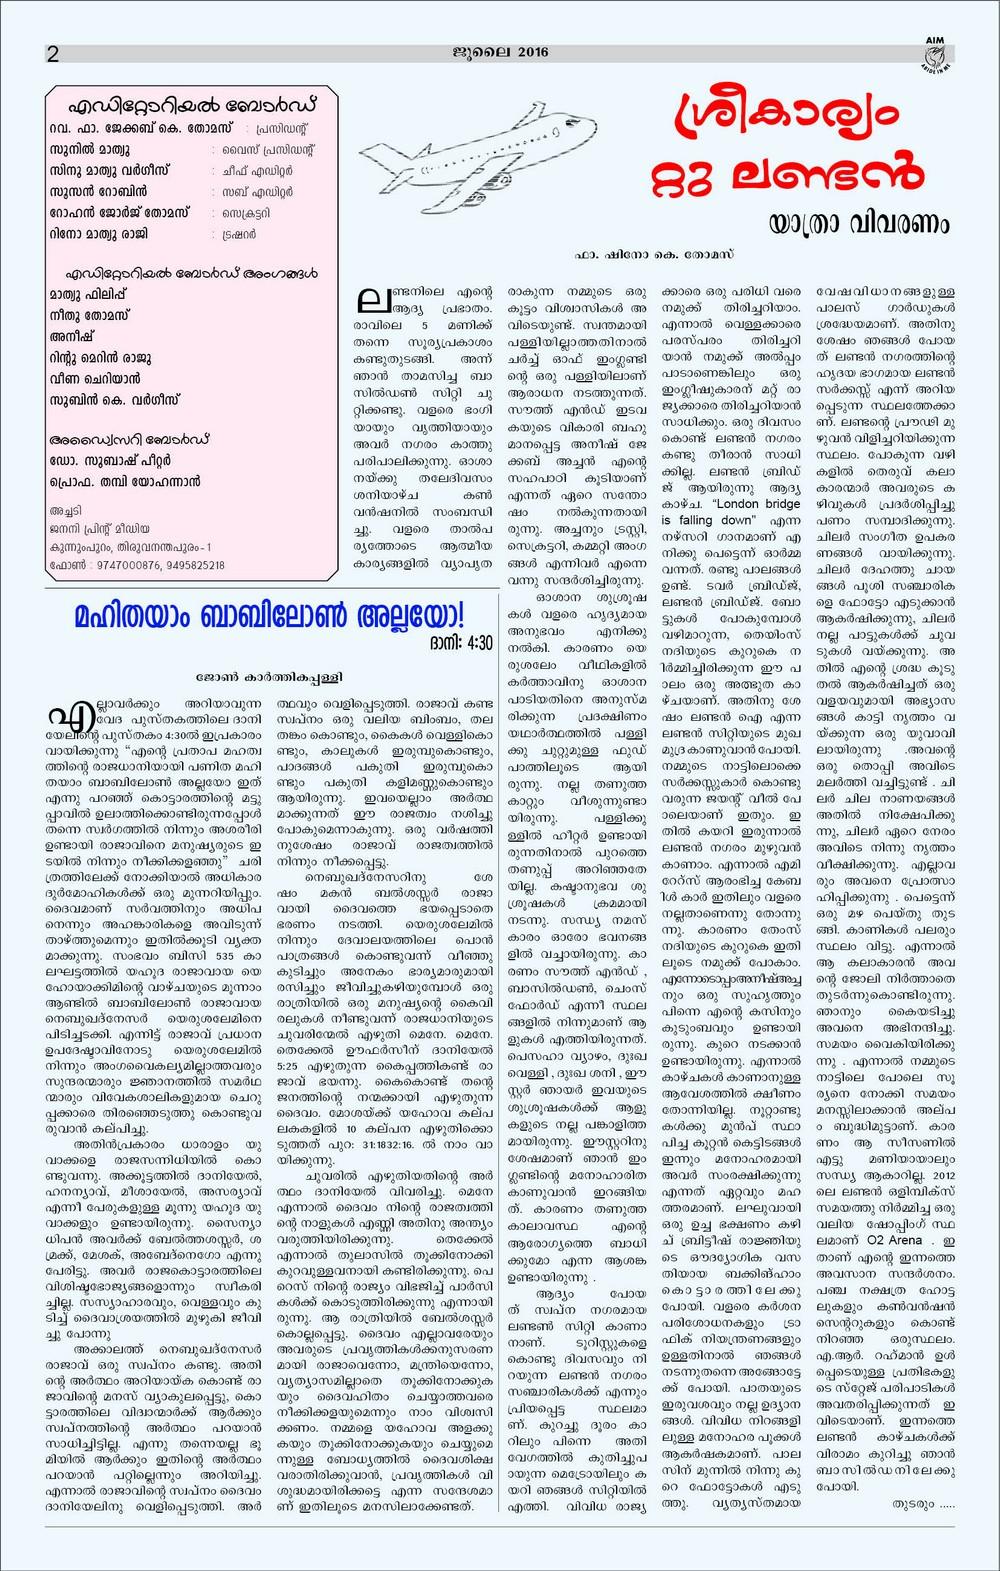 AIM JULY INTERNET EDN PAGE-2